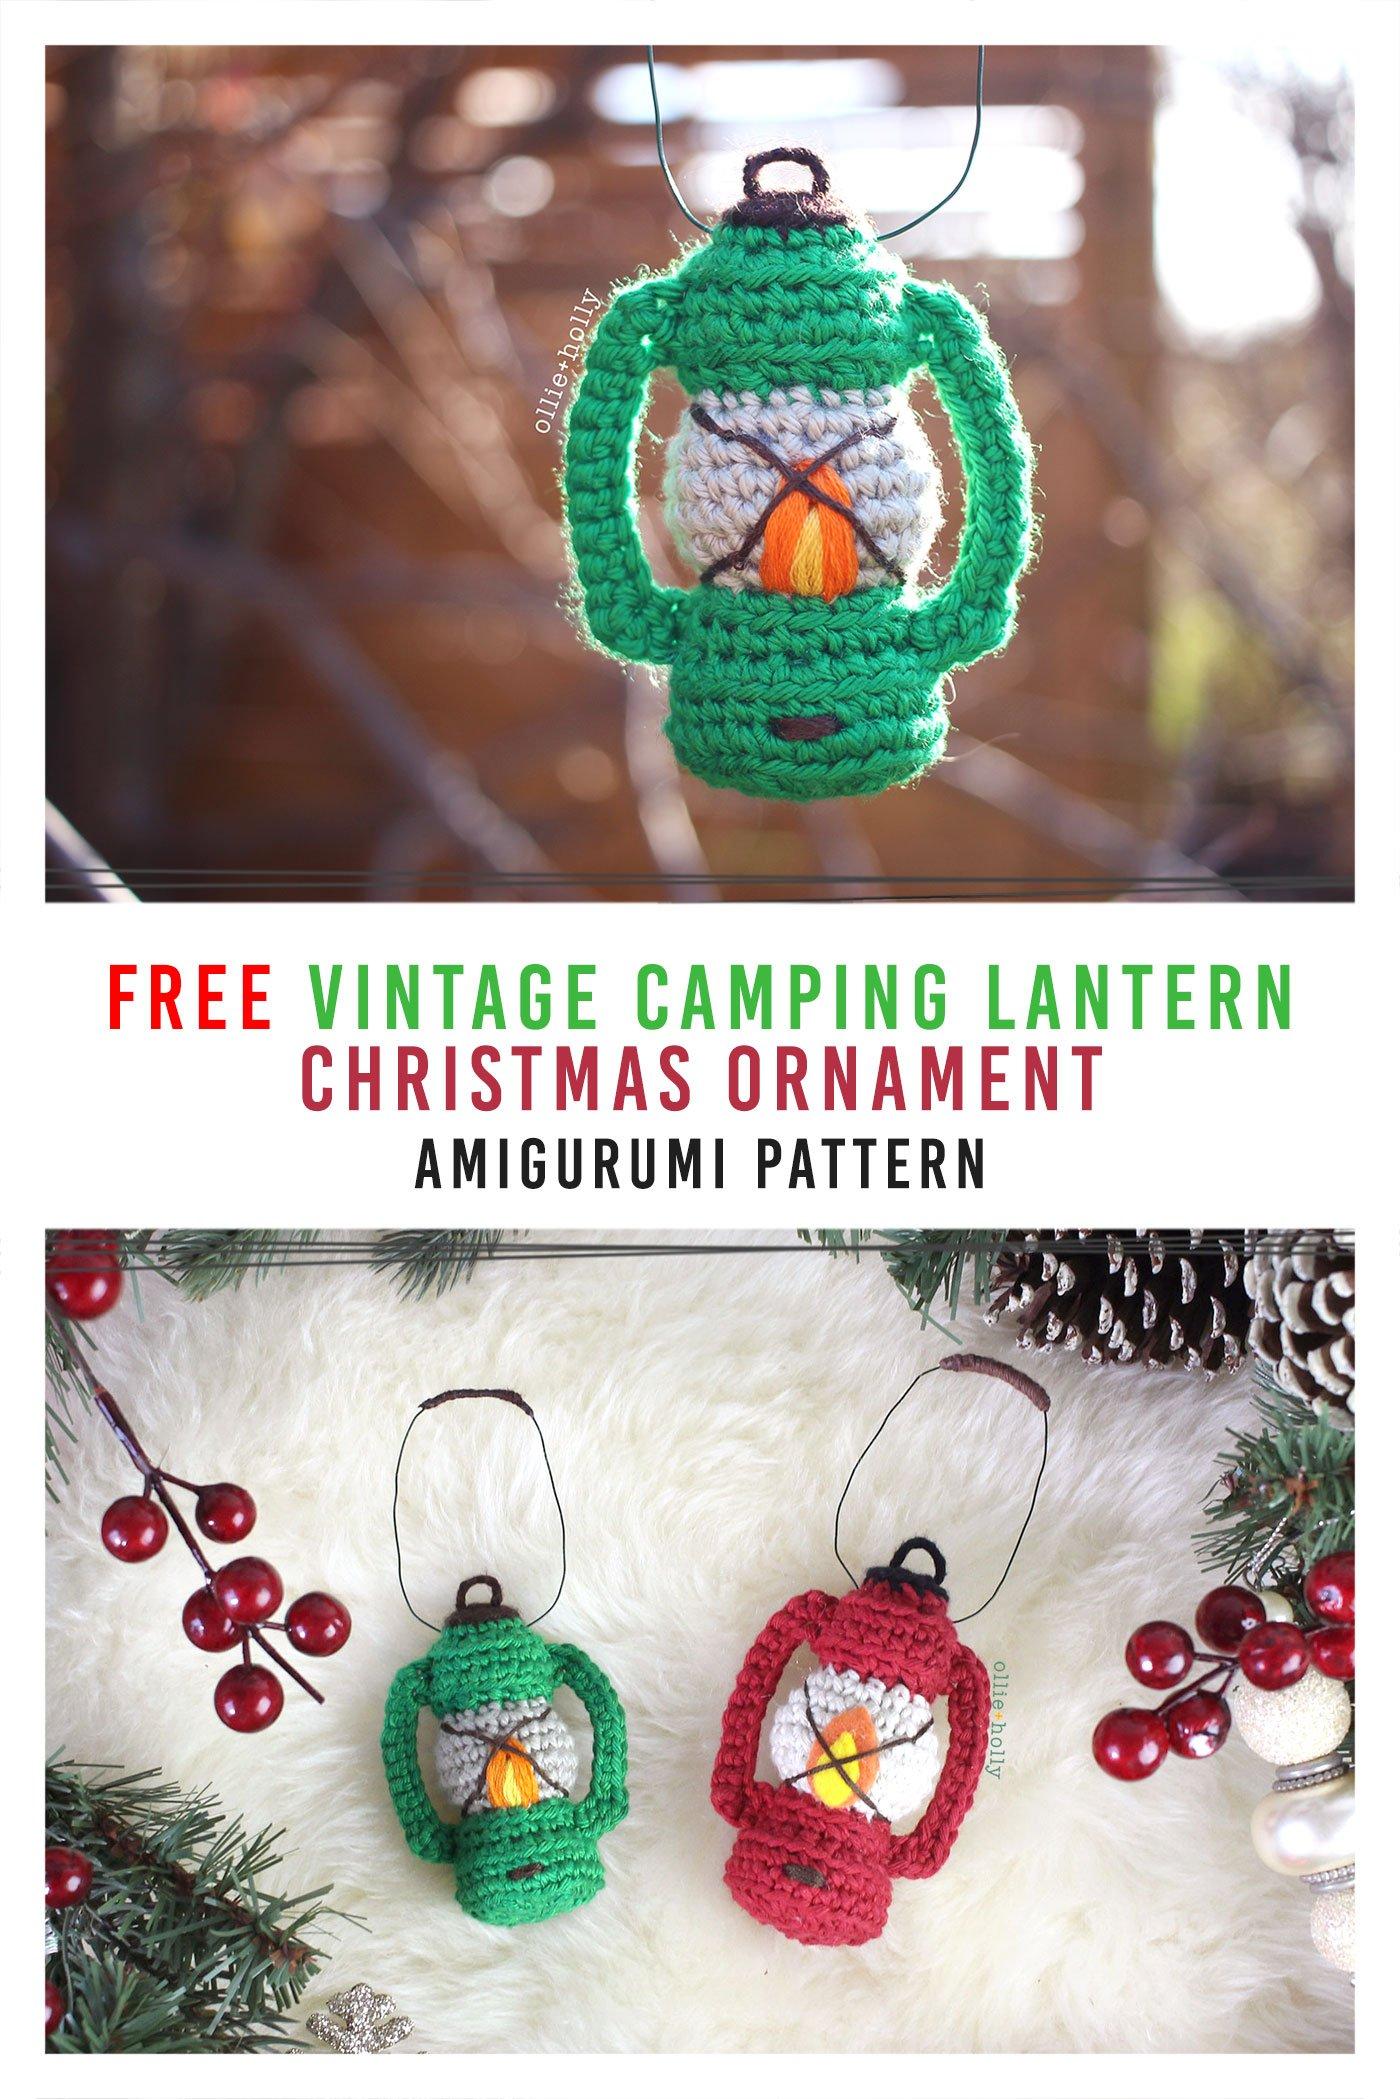 Free Vintage Camping Lantern Amigurumi Crochet Christmas Ornament Pattern